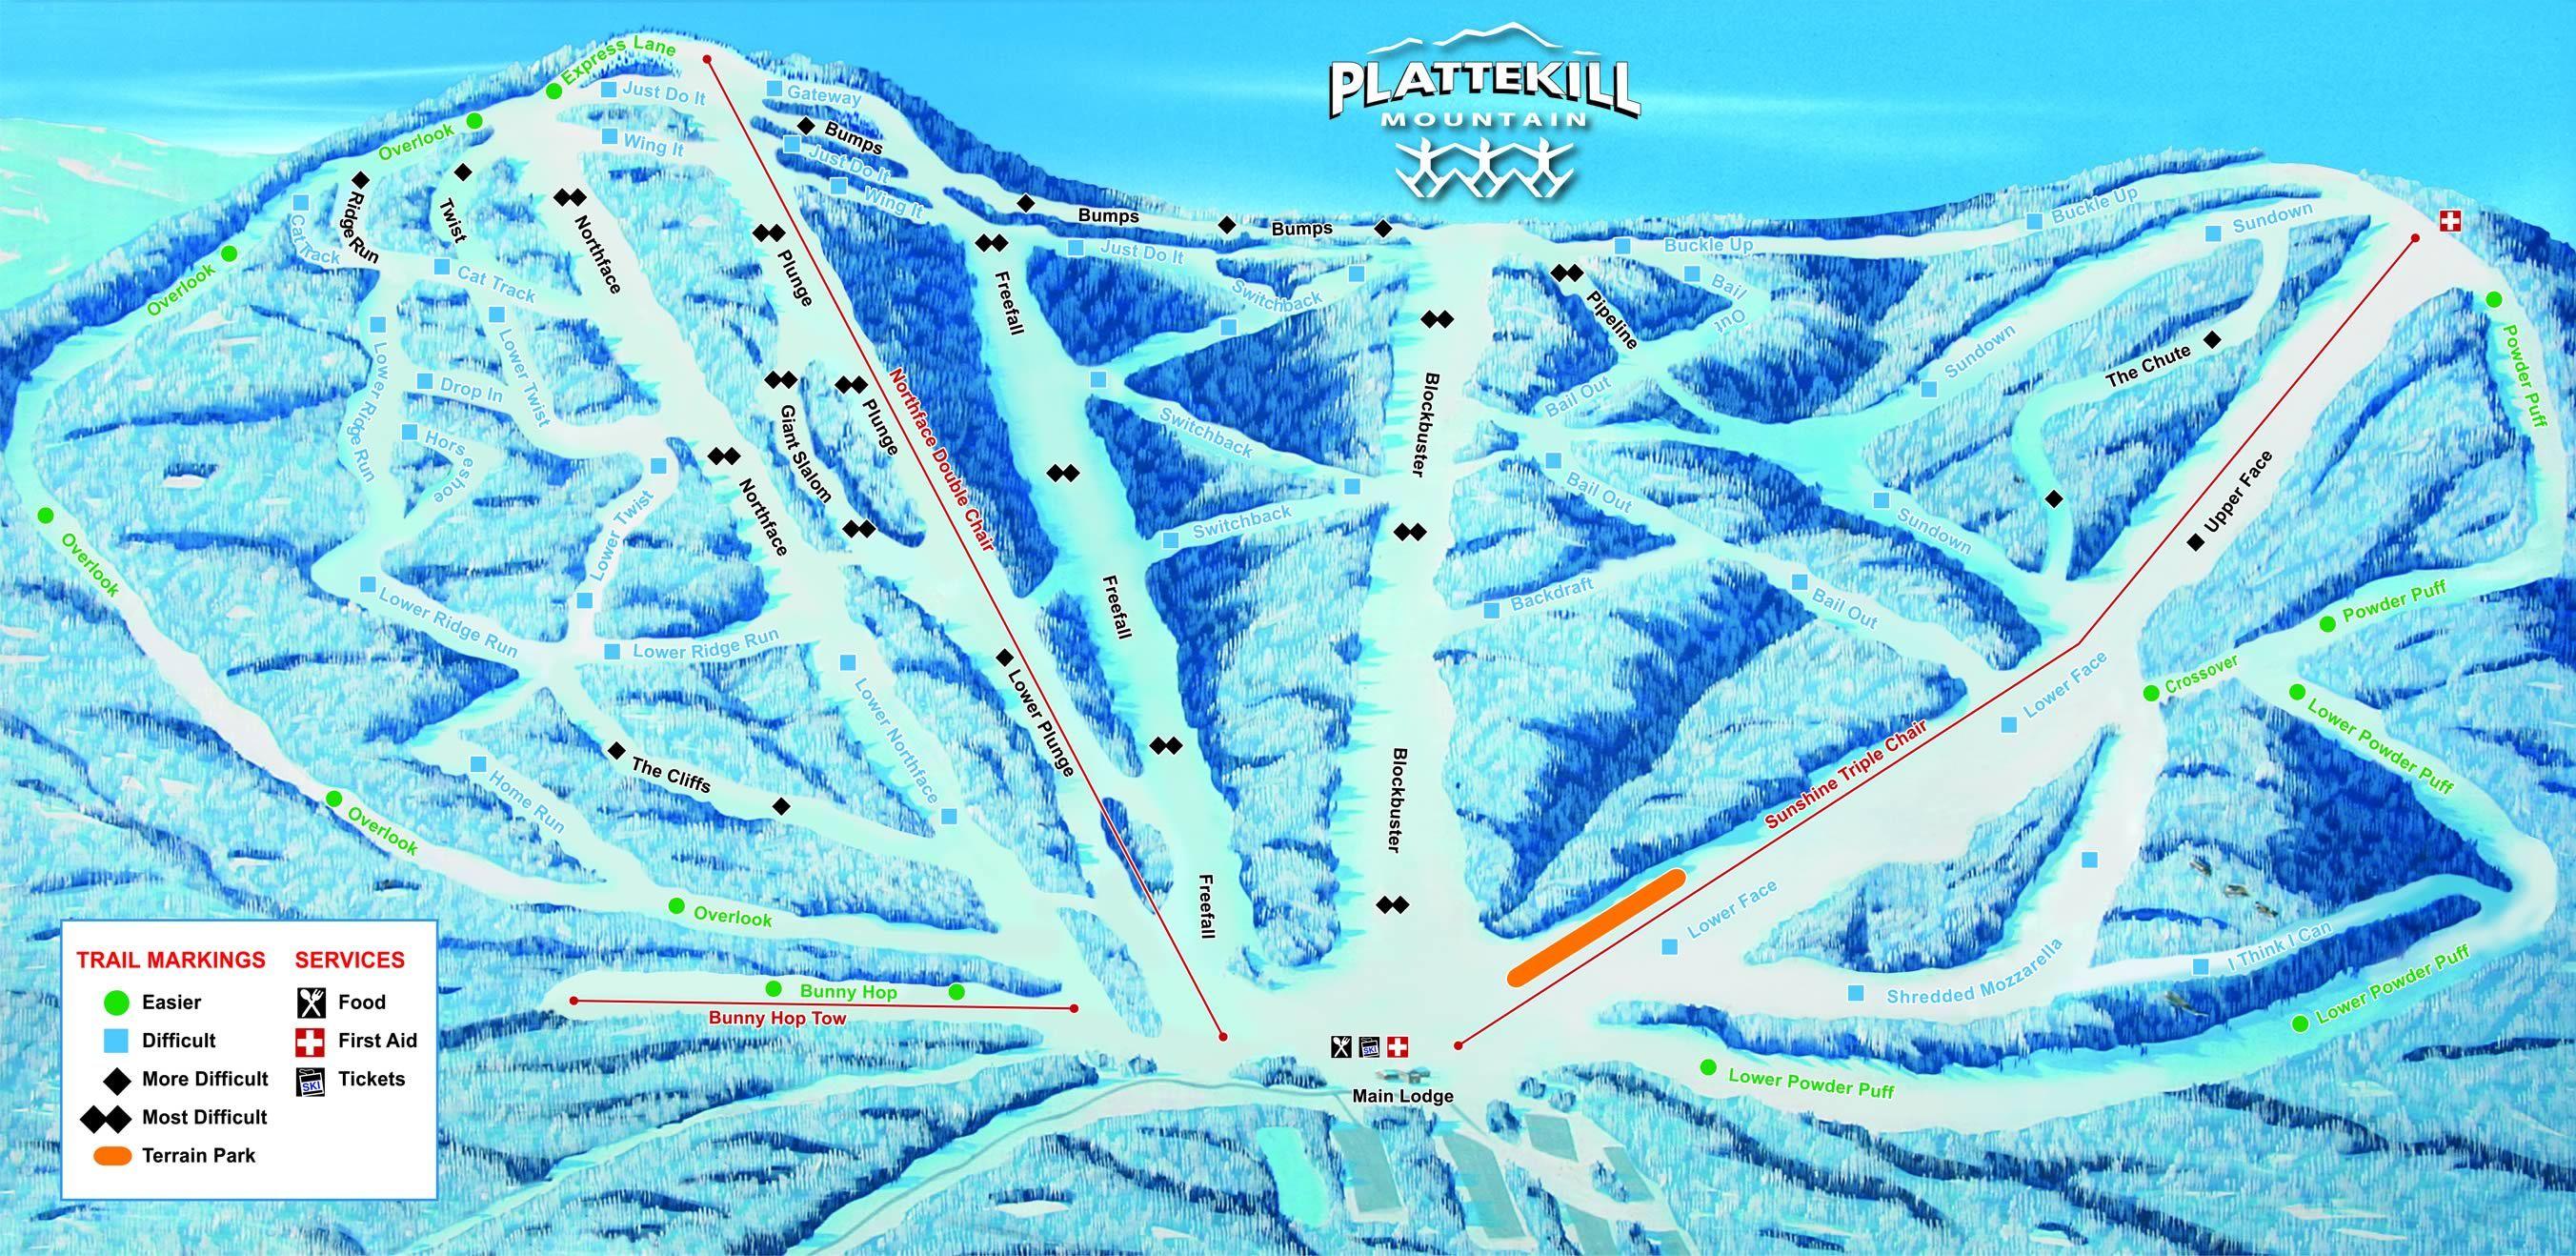 Plattekill Mountain, Catskills | NY Ski Resorts | Skiing ... on catskill albany map, catskill mt map, catskill ski resorts map, catskill ski areas map, catskill rail trail, catskill ny map, catskill escarpment, catskill scenic trail, catskill forest map, catskill park new york, village of catskill map, catskill state park map, catskill park waterfalls map, catskill high peaks map, catskill mountains, catskill forest preserve, catskill topographic map,